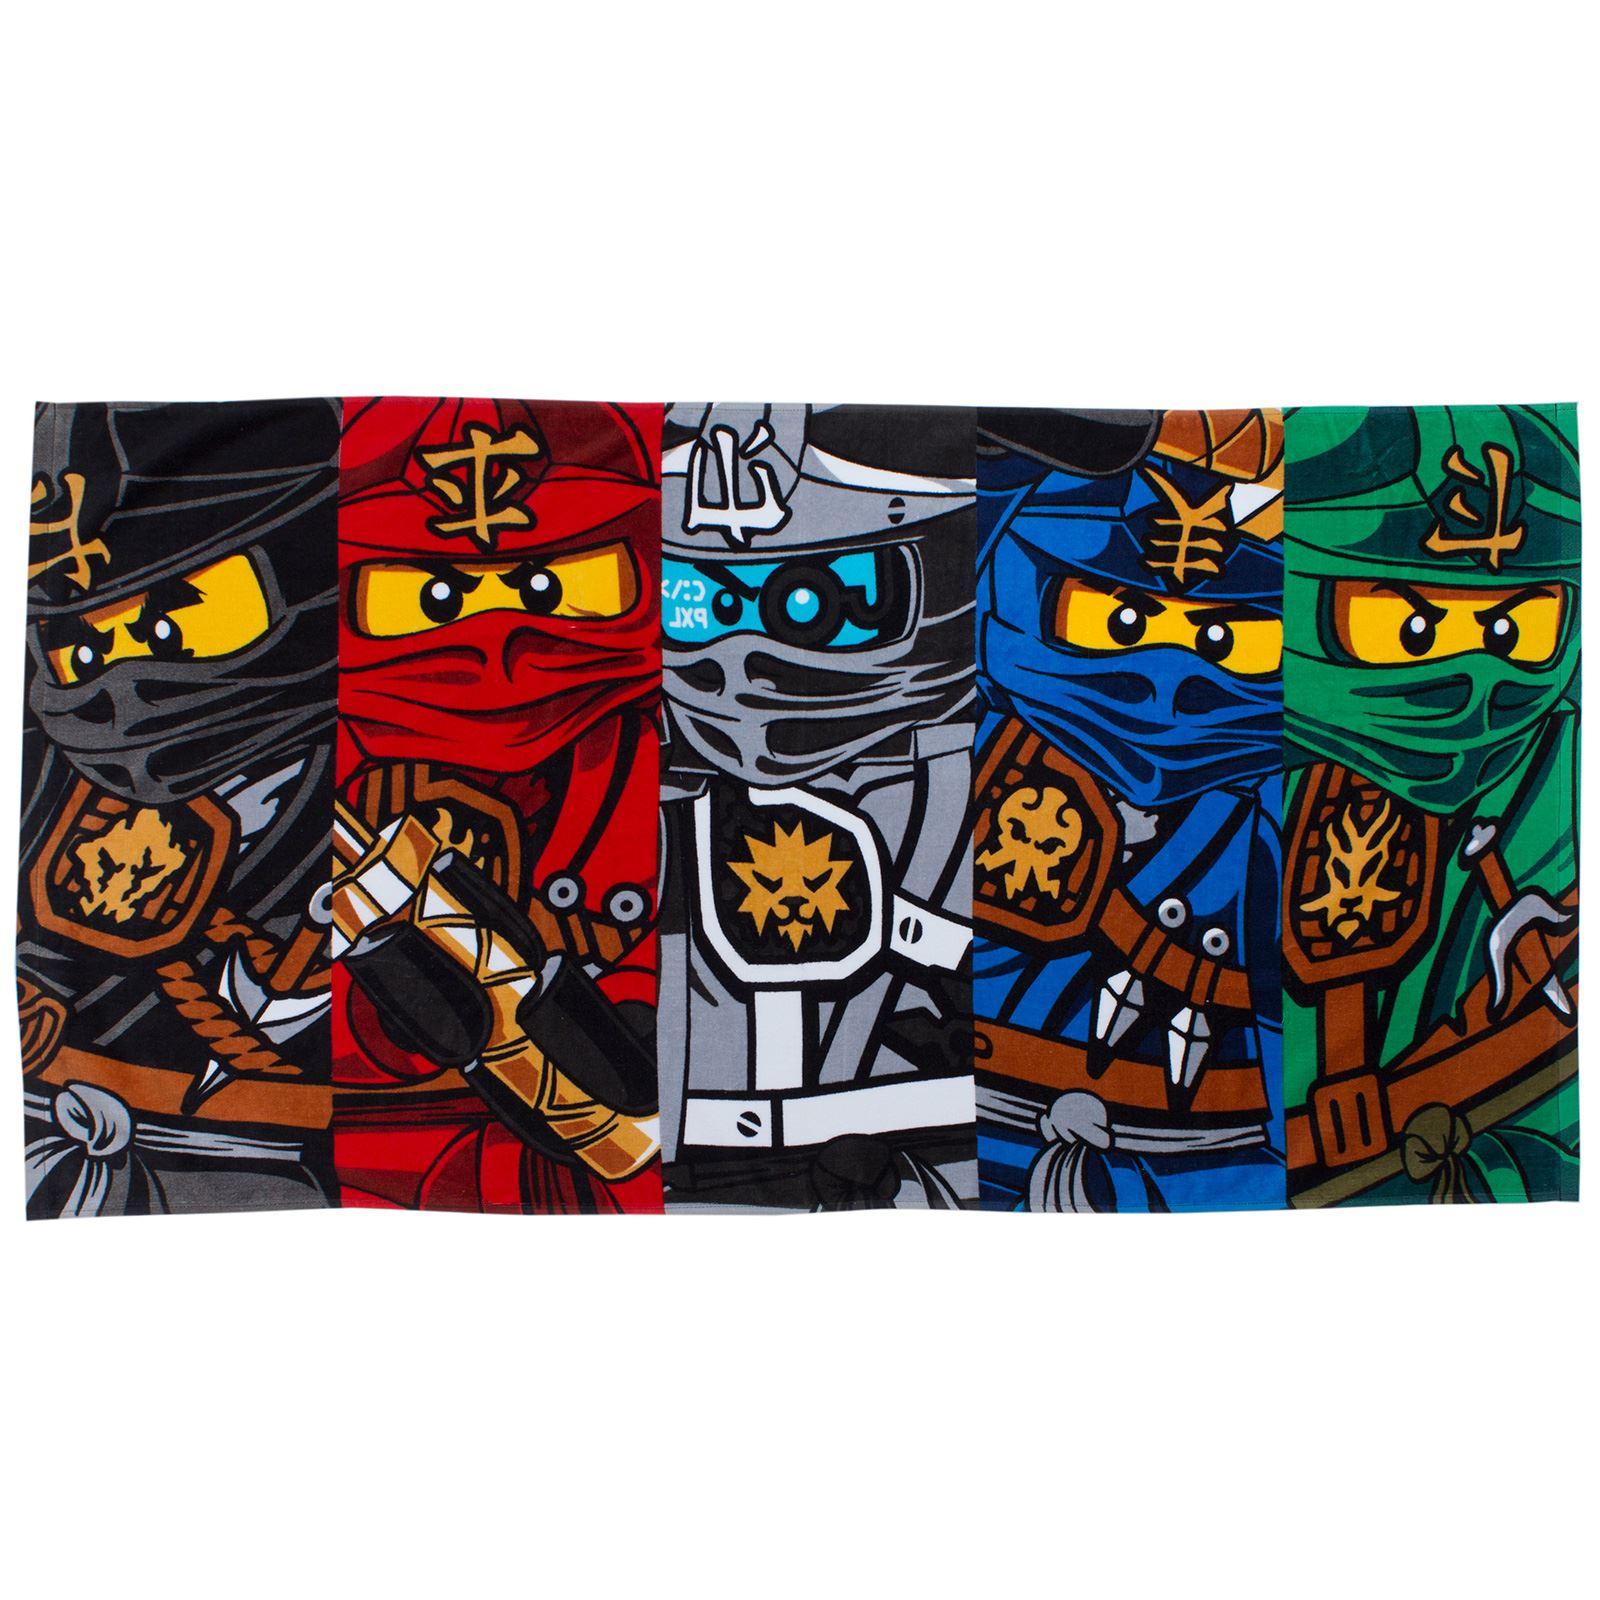 LEGO-Toallas-amp-ponchos-infantil-algodon-toalla-playa-Star-Wars-DC-Comics-NINJAGO